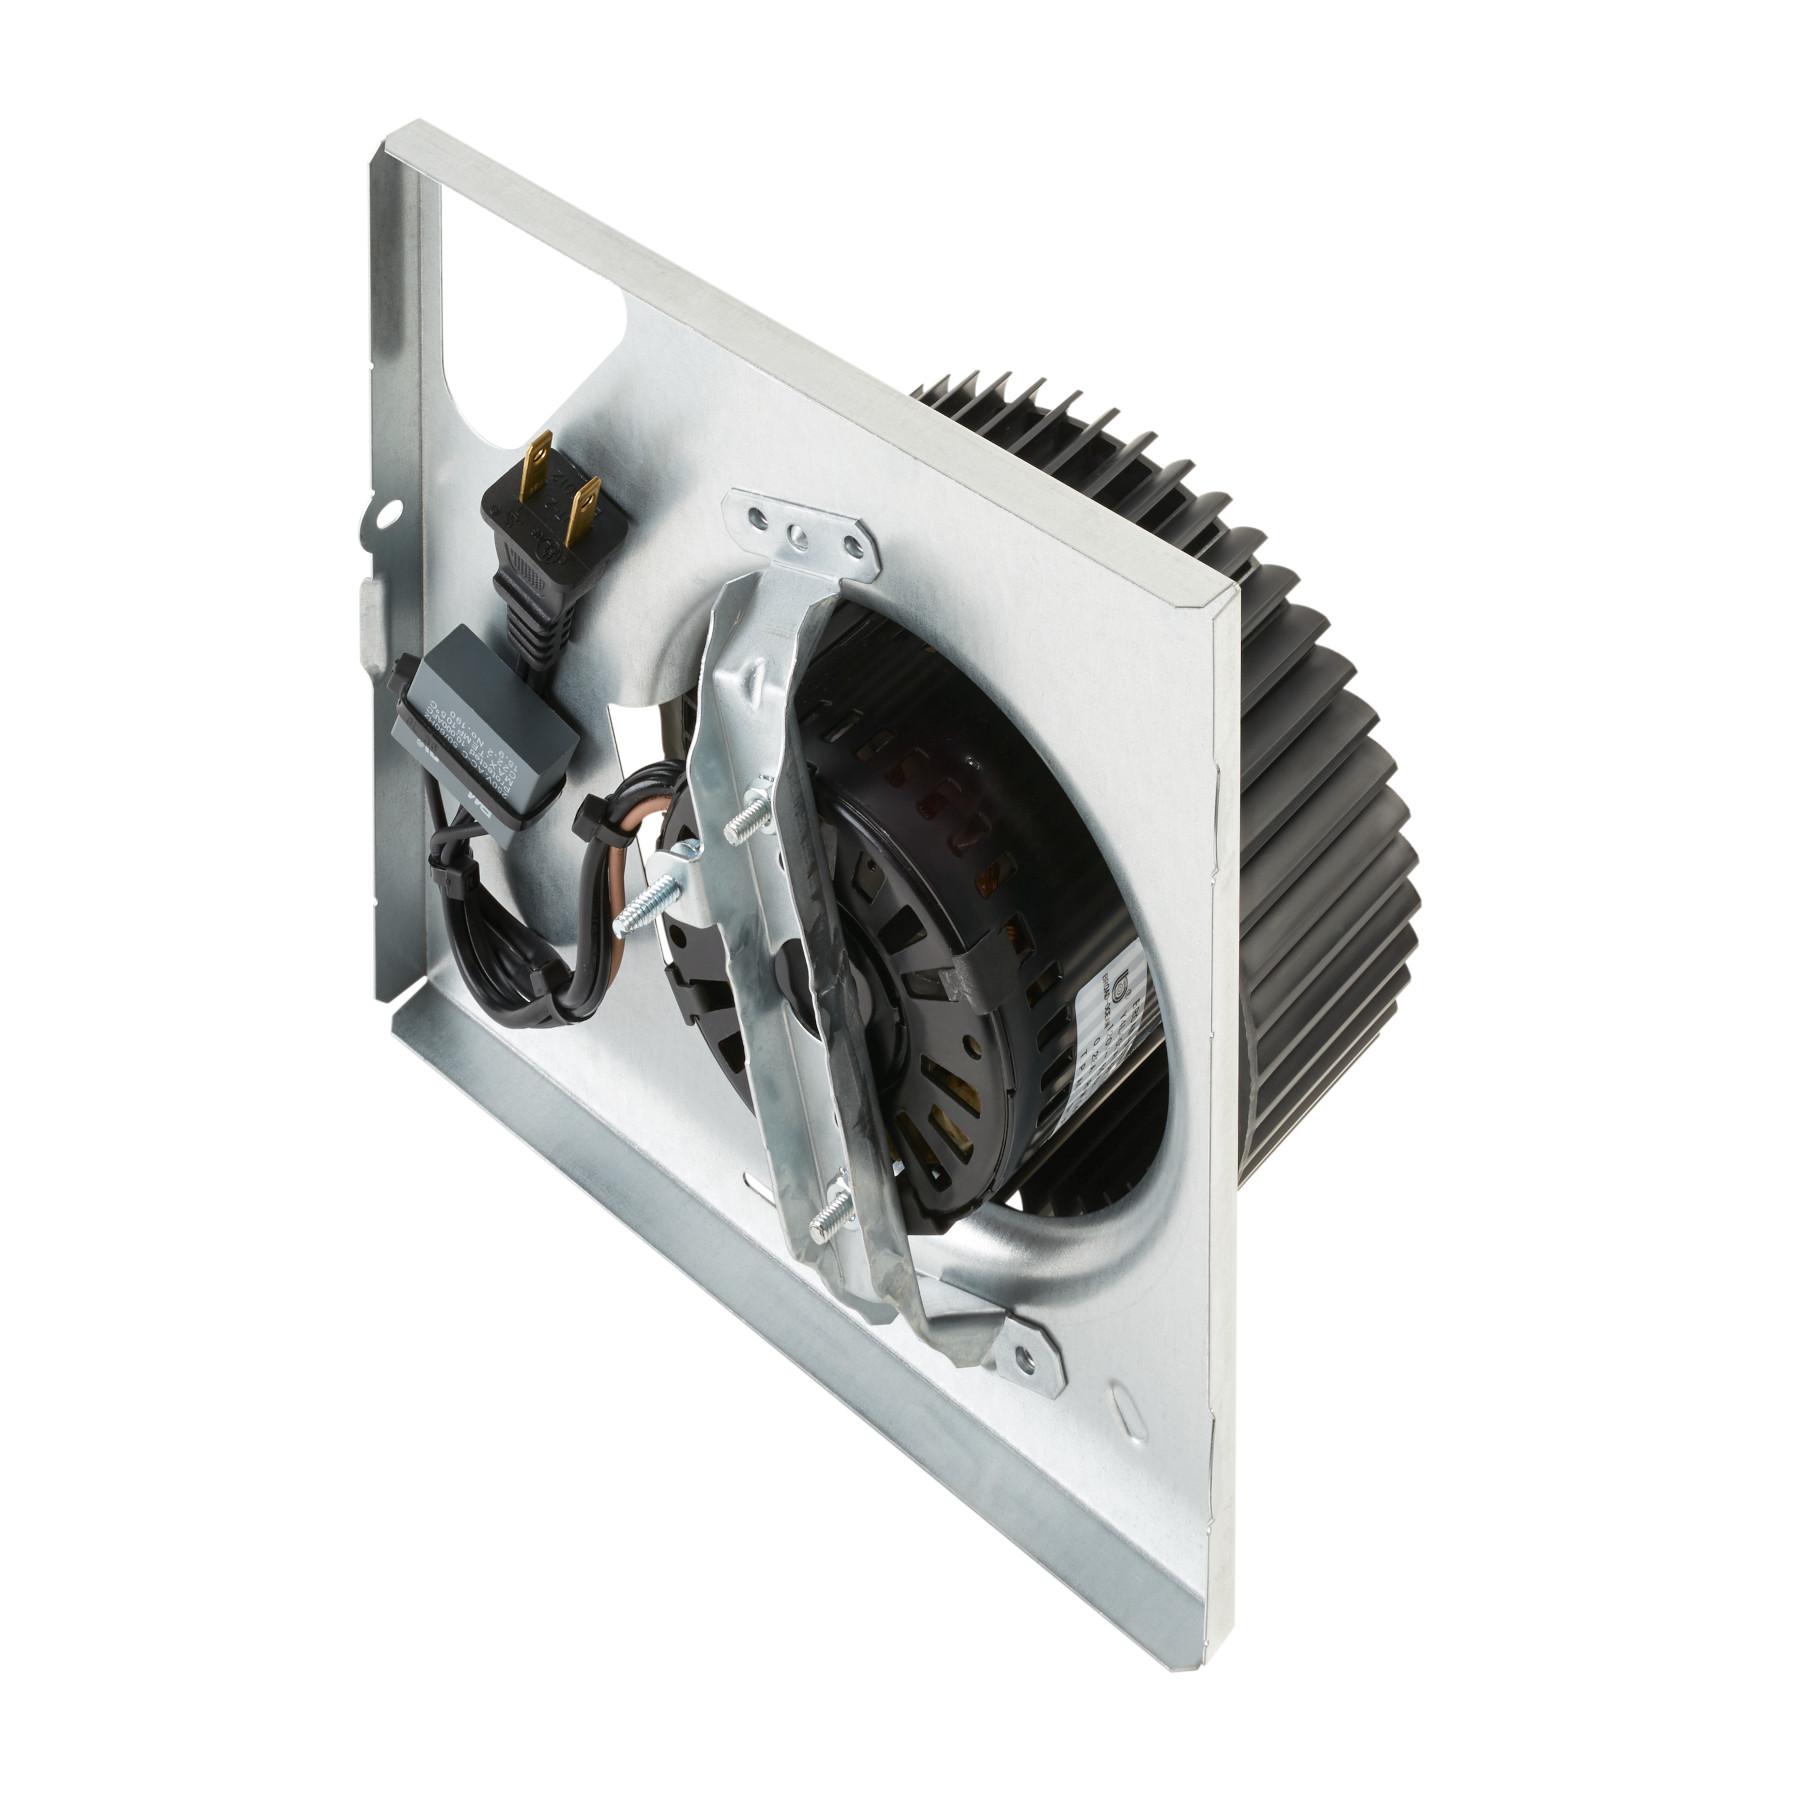 "Broan-NuTone® 80 CFM Quick Install Bath Fan Motor Upgrade for 8"" x 8-1/4"" x 5-3/4"" housings"